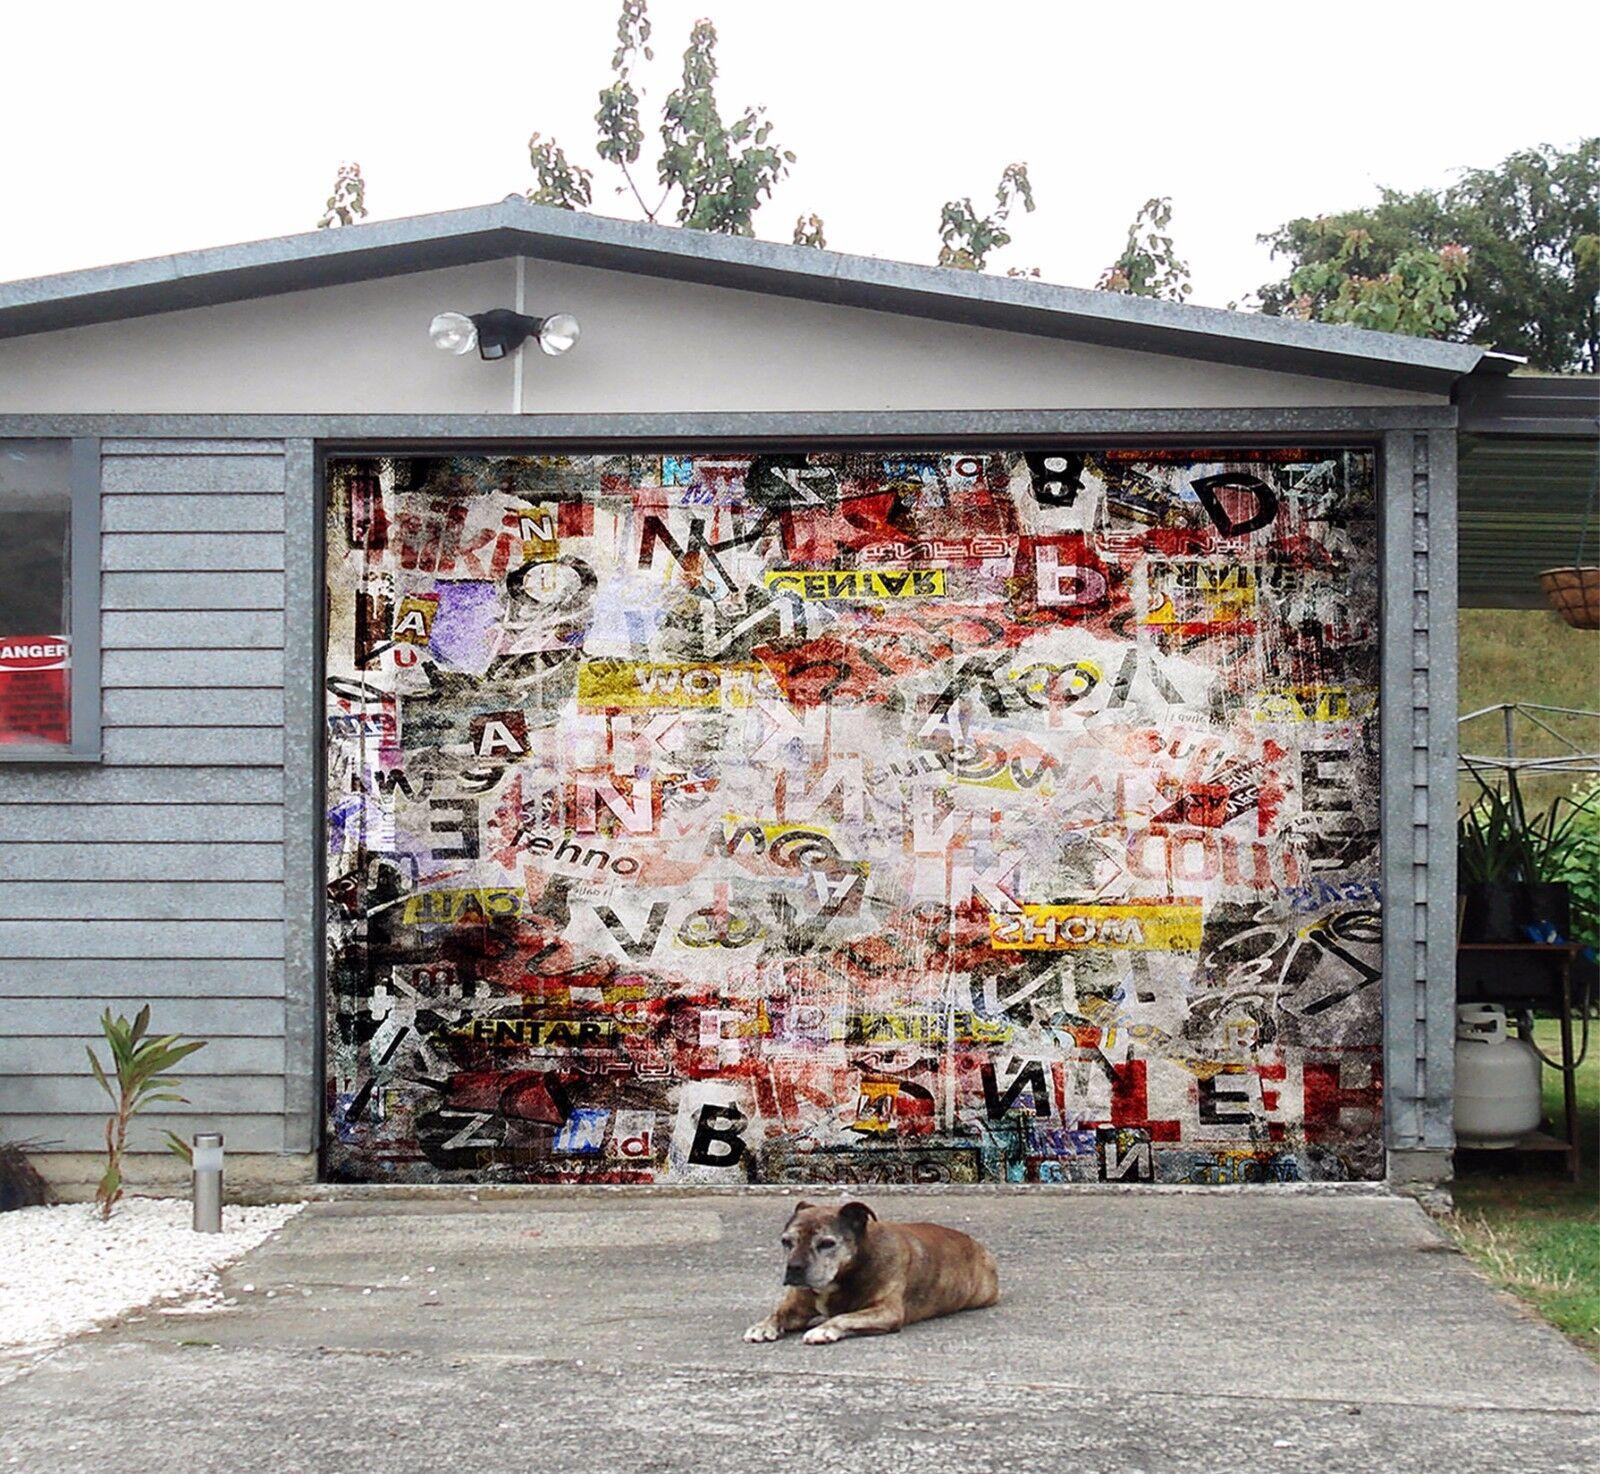 3D Fuzzy graffiti Garage Door Murals Wall Print Decal Wall Deco AJ WALLPAPER UK